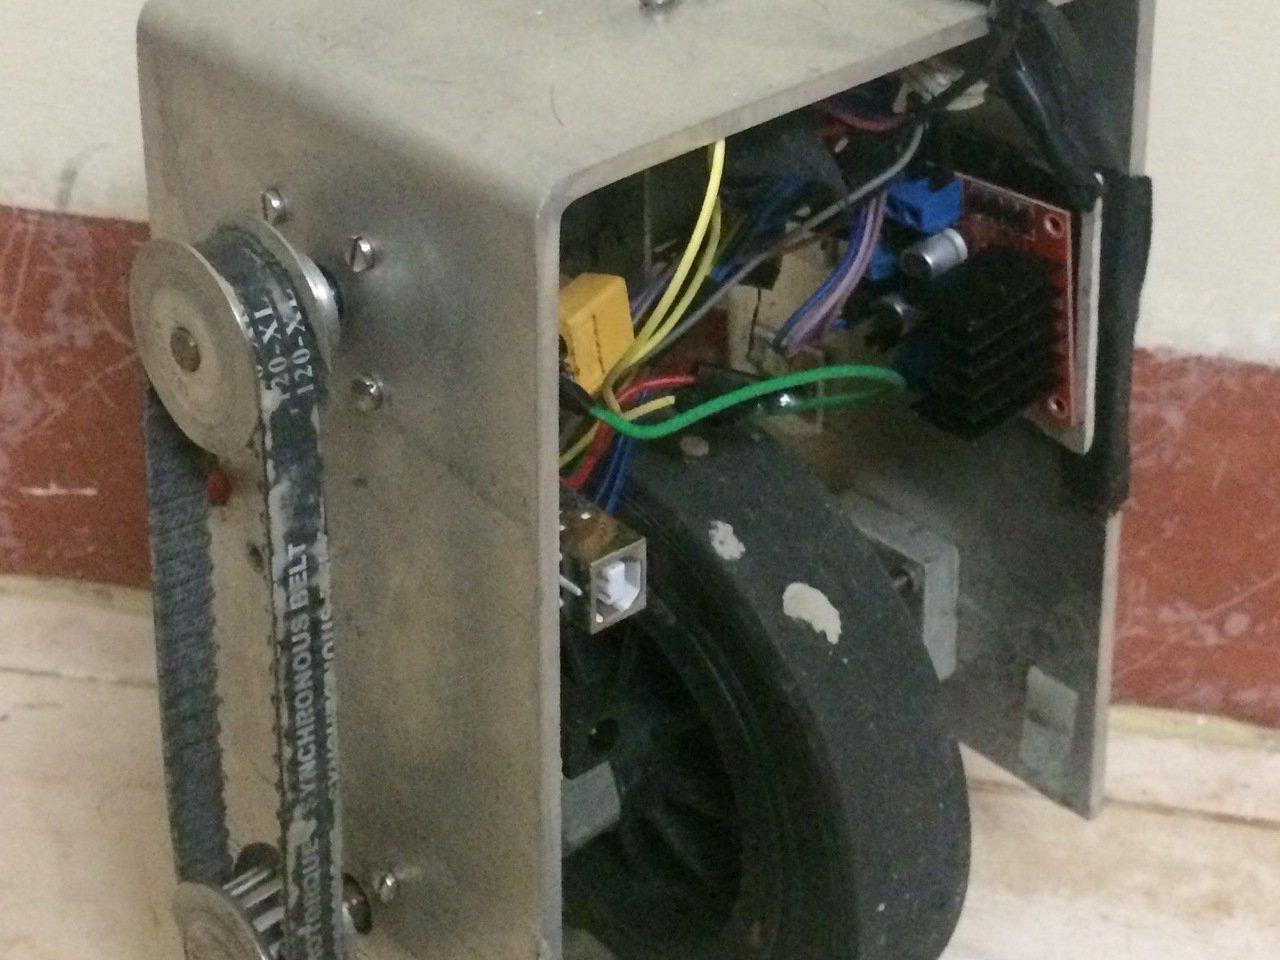 One wheeled balancing robot